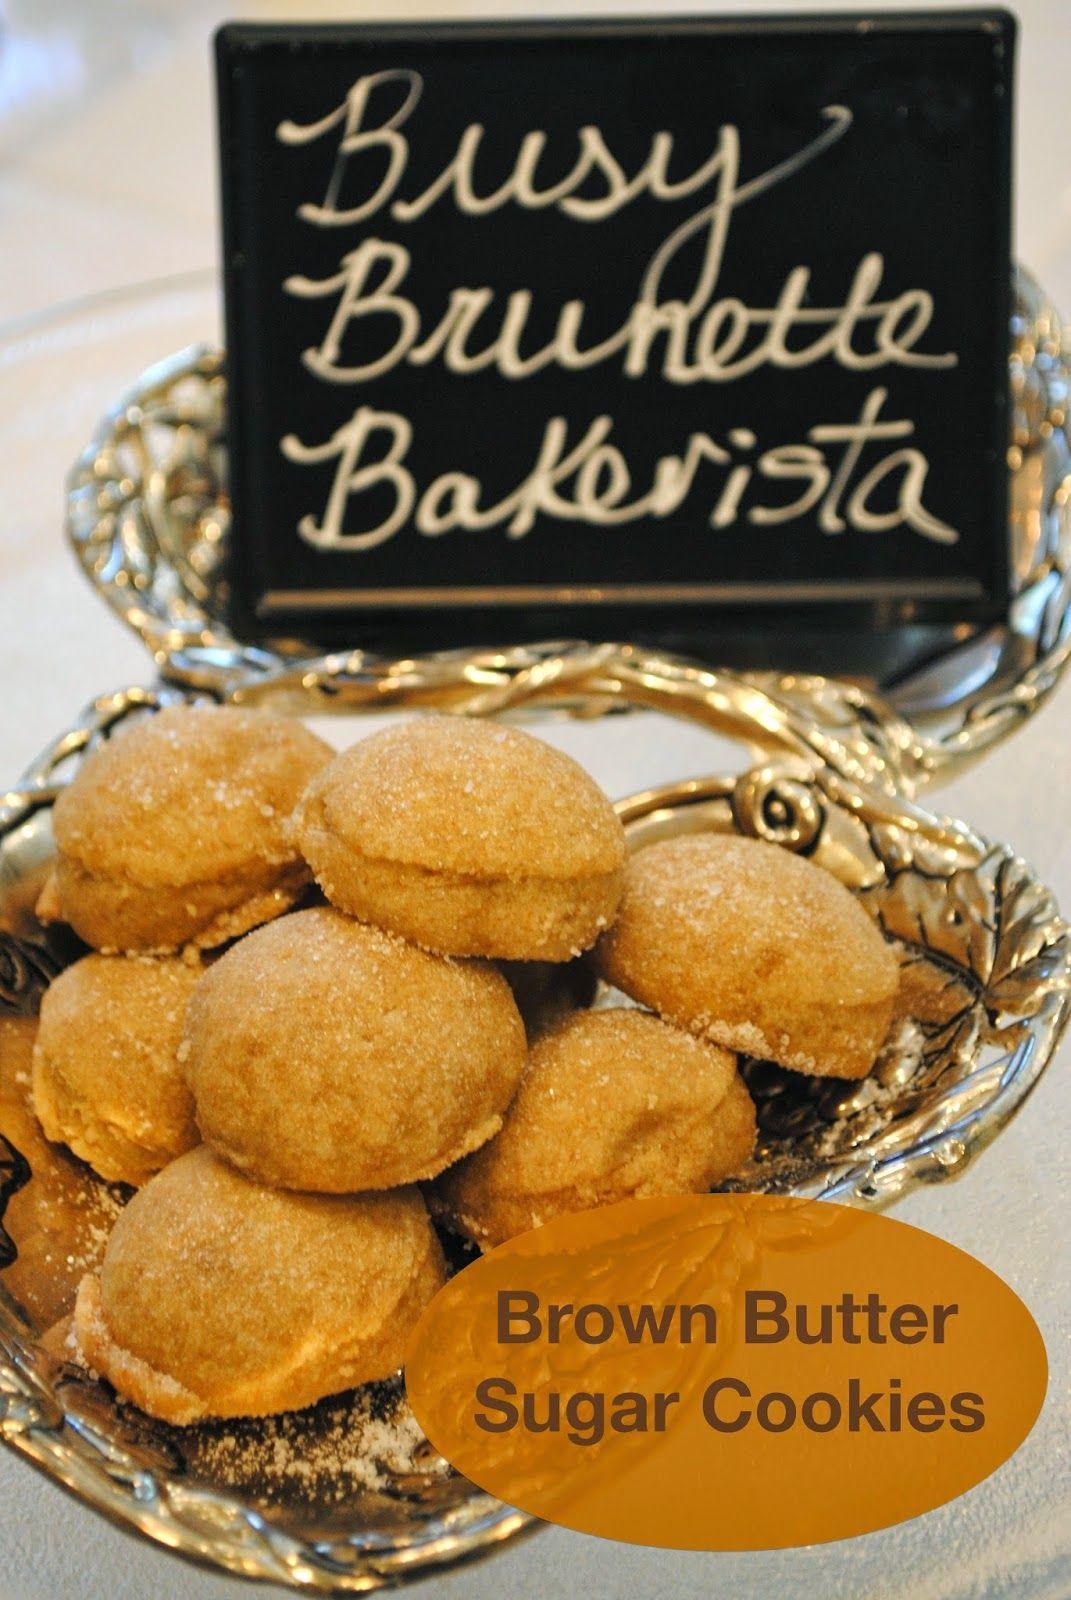 Busy bakerista brown butter sugar cookies